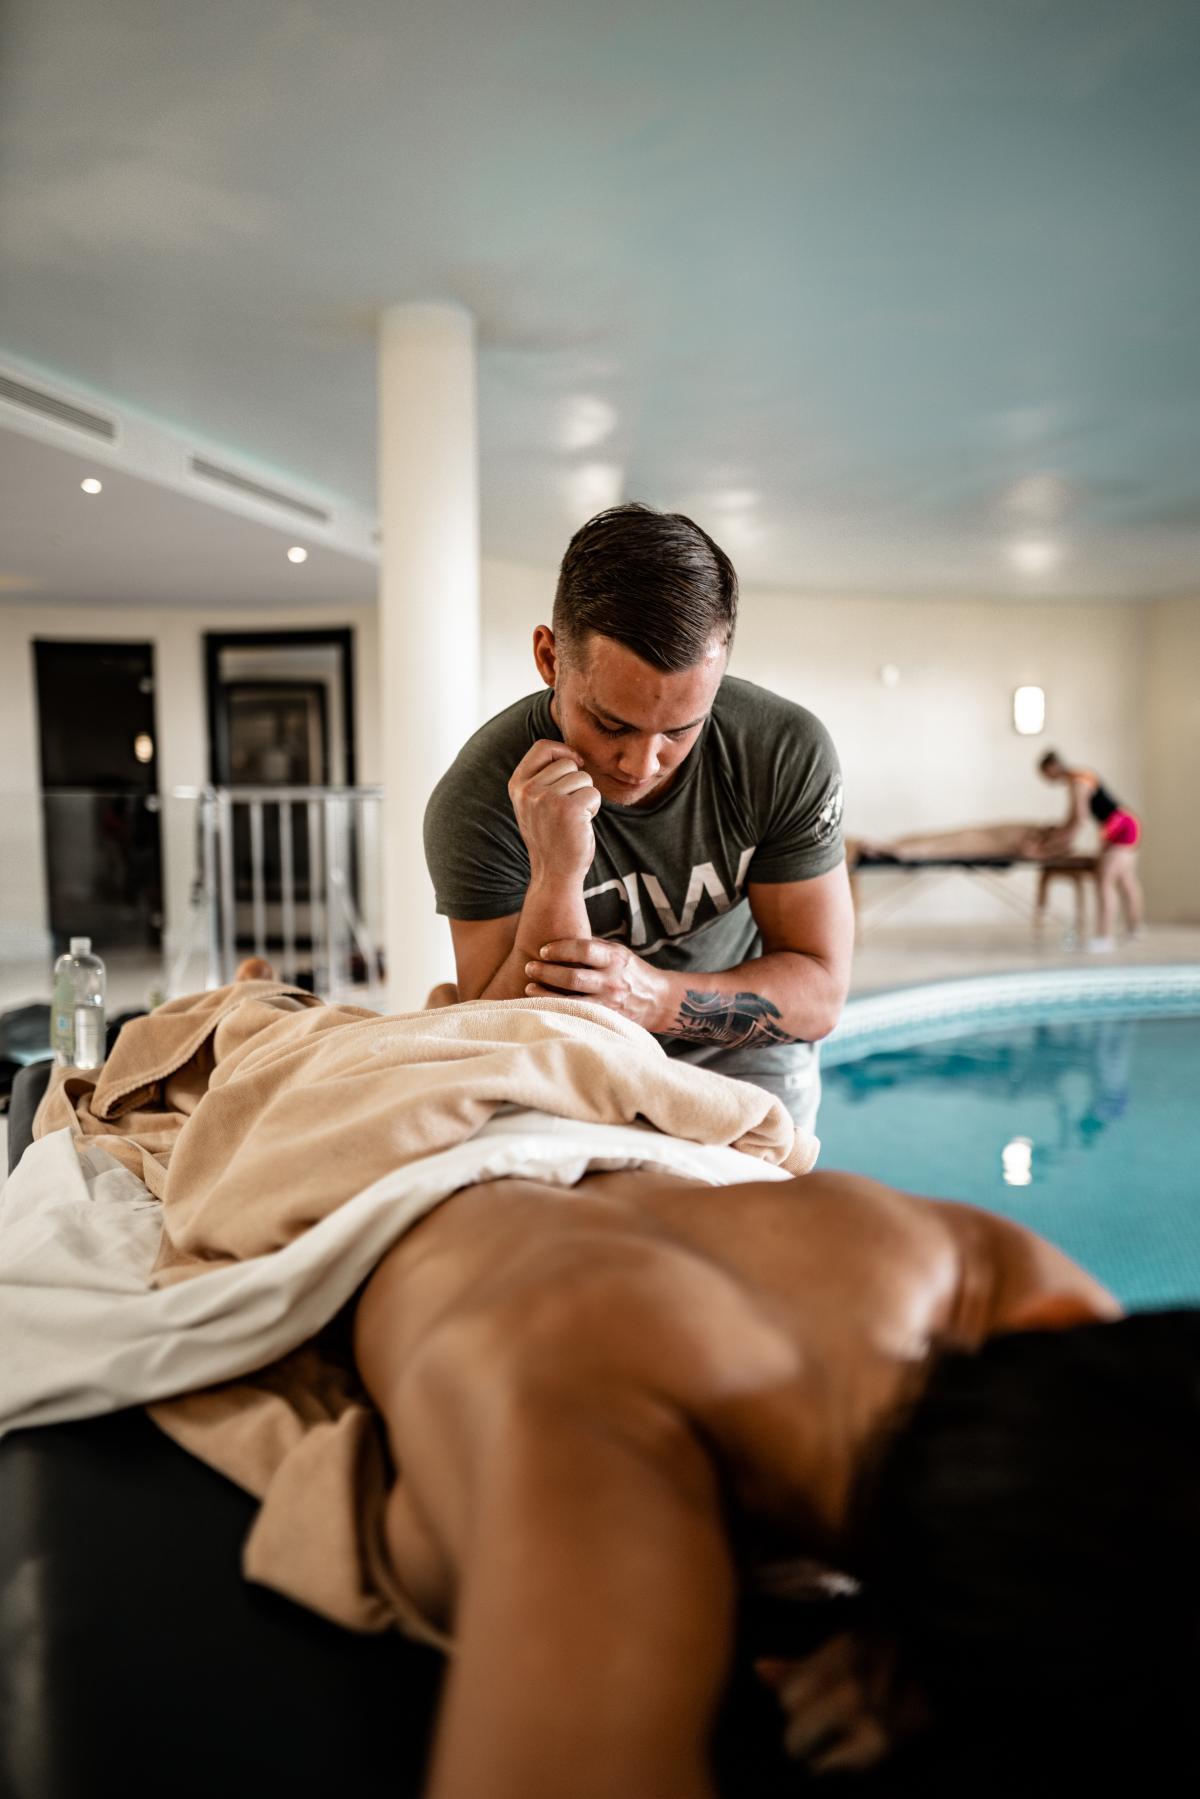 Health spa Place of business Establishment #425214